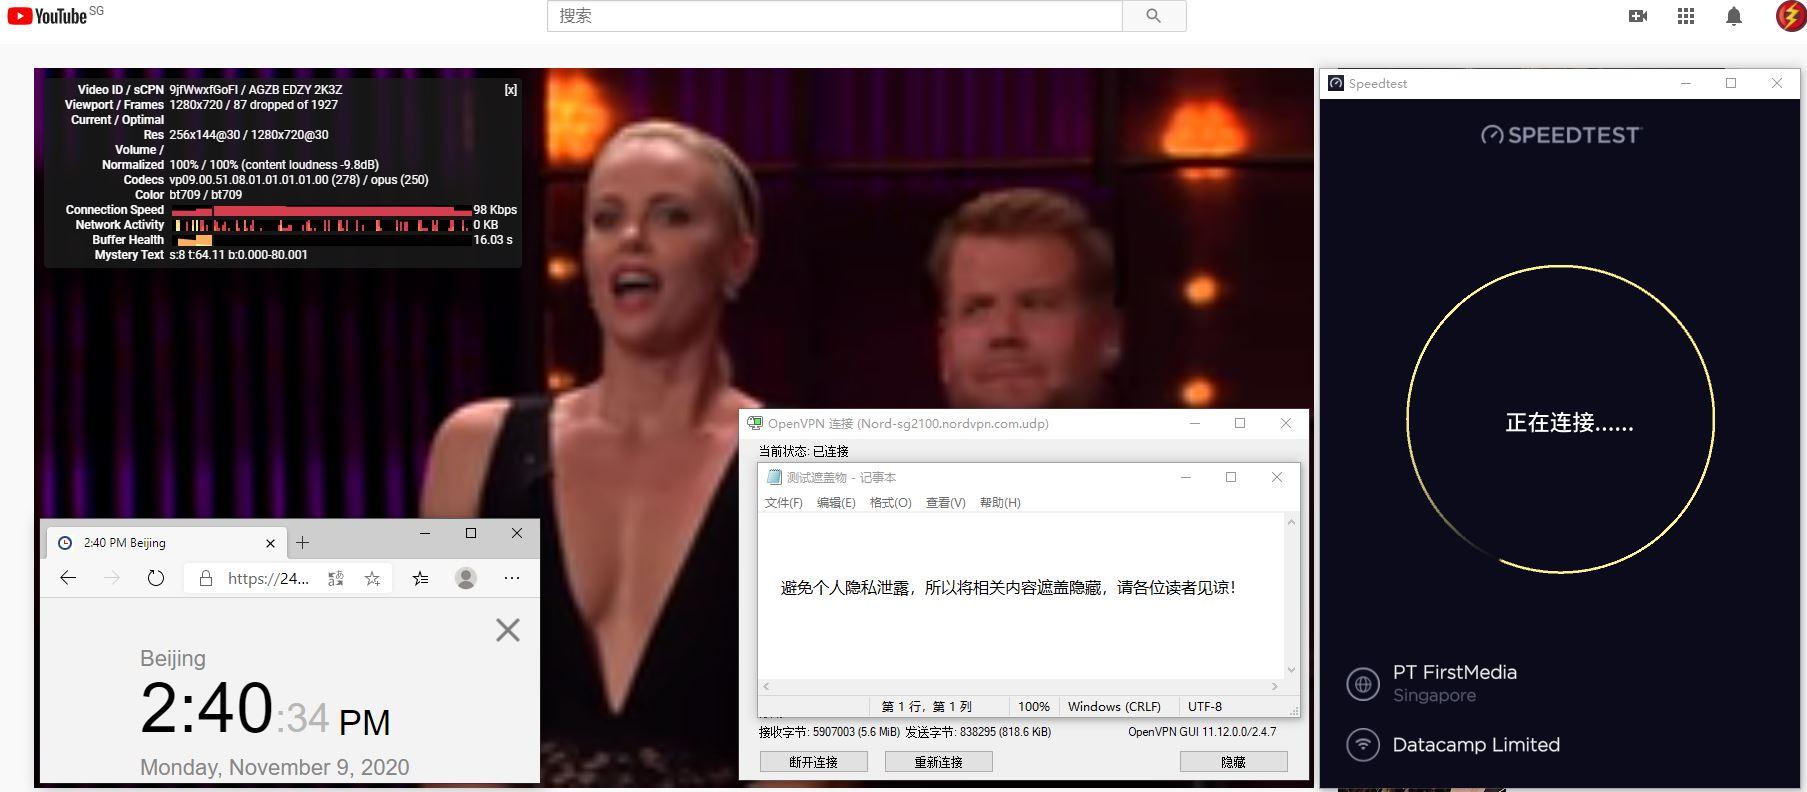 Windows10 NordVPN OpenVPN Gui Sg2100 服务器 中国VPN 翻墙 科学上网 测试 - 20201109Windows10 NordVPN OpenVPN Gui Sg2100 服务器 中国VPN 翻墙 科学上网 测试 - 20201109